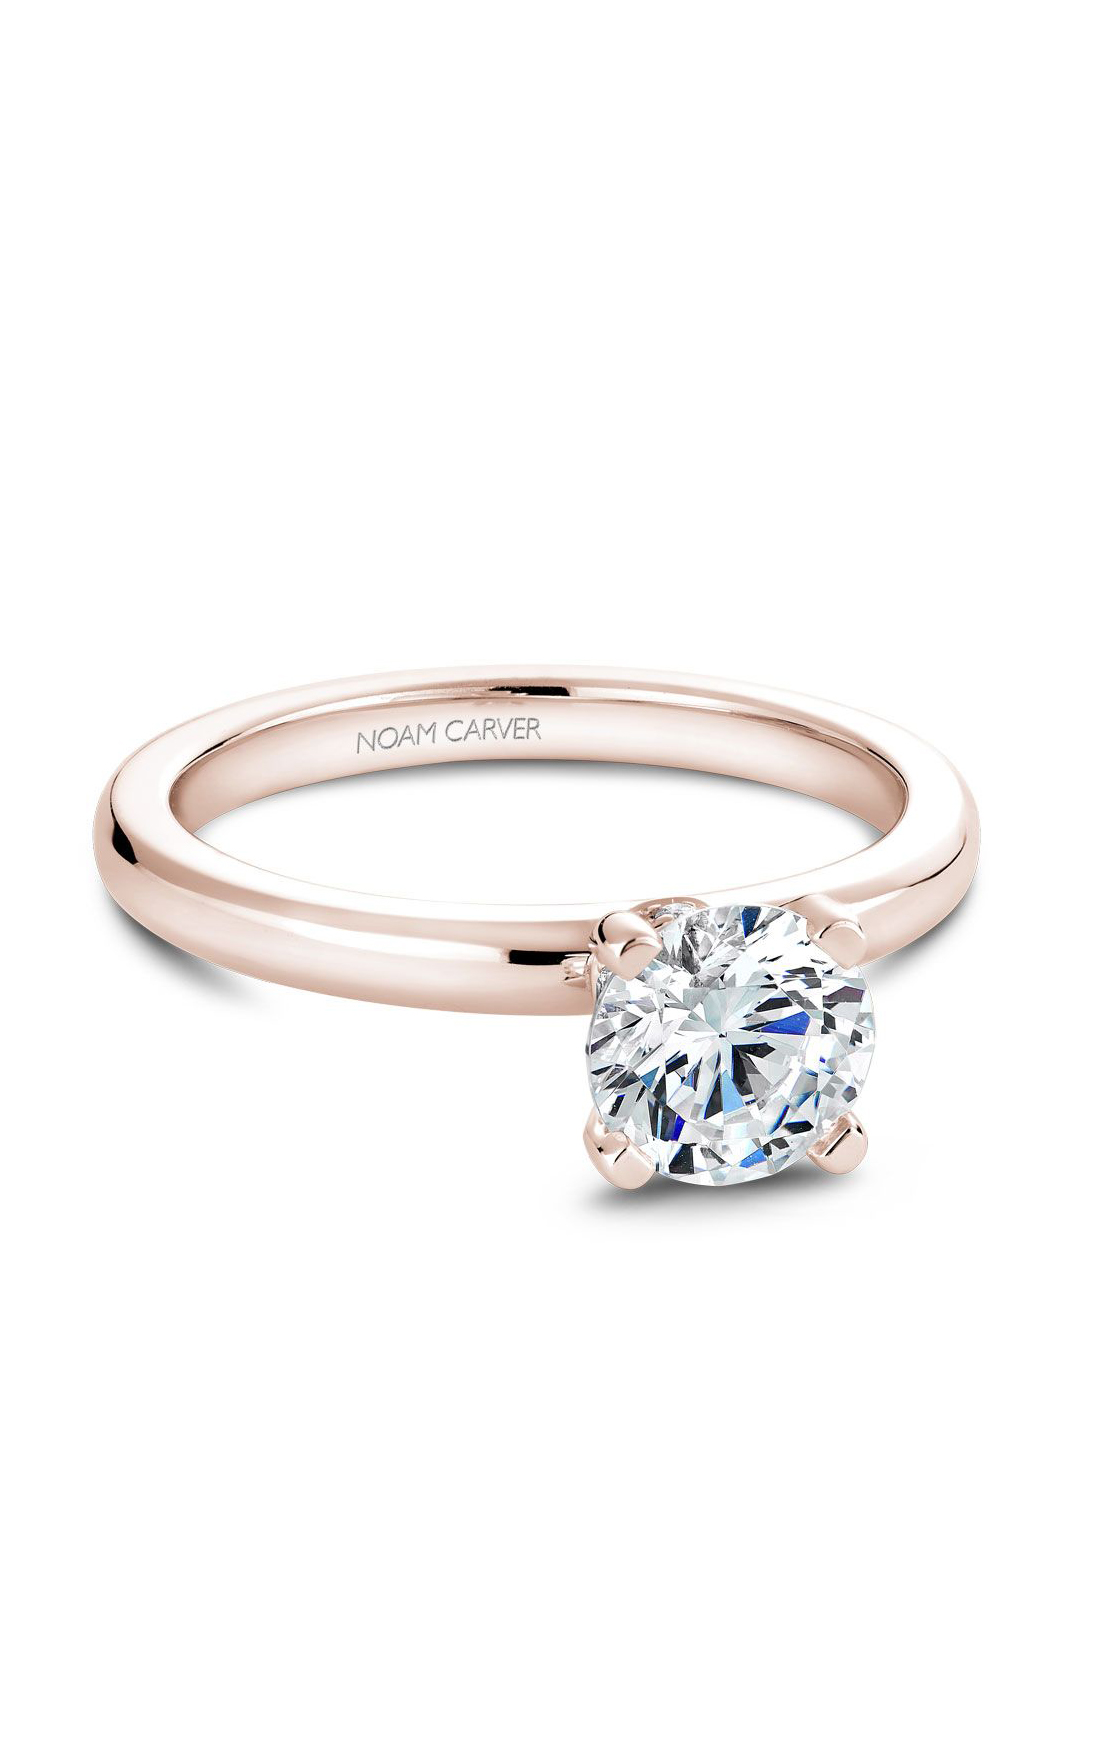 Noam Carver Classic Engagement Ring B012-02RA product image